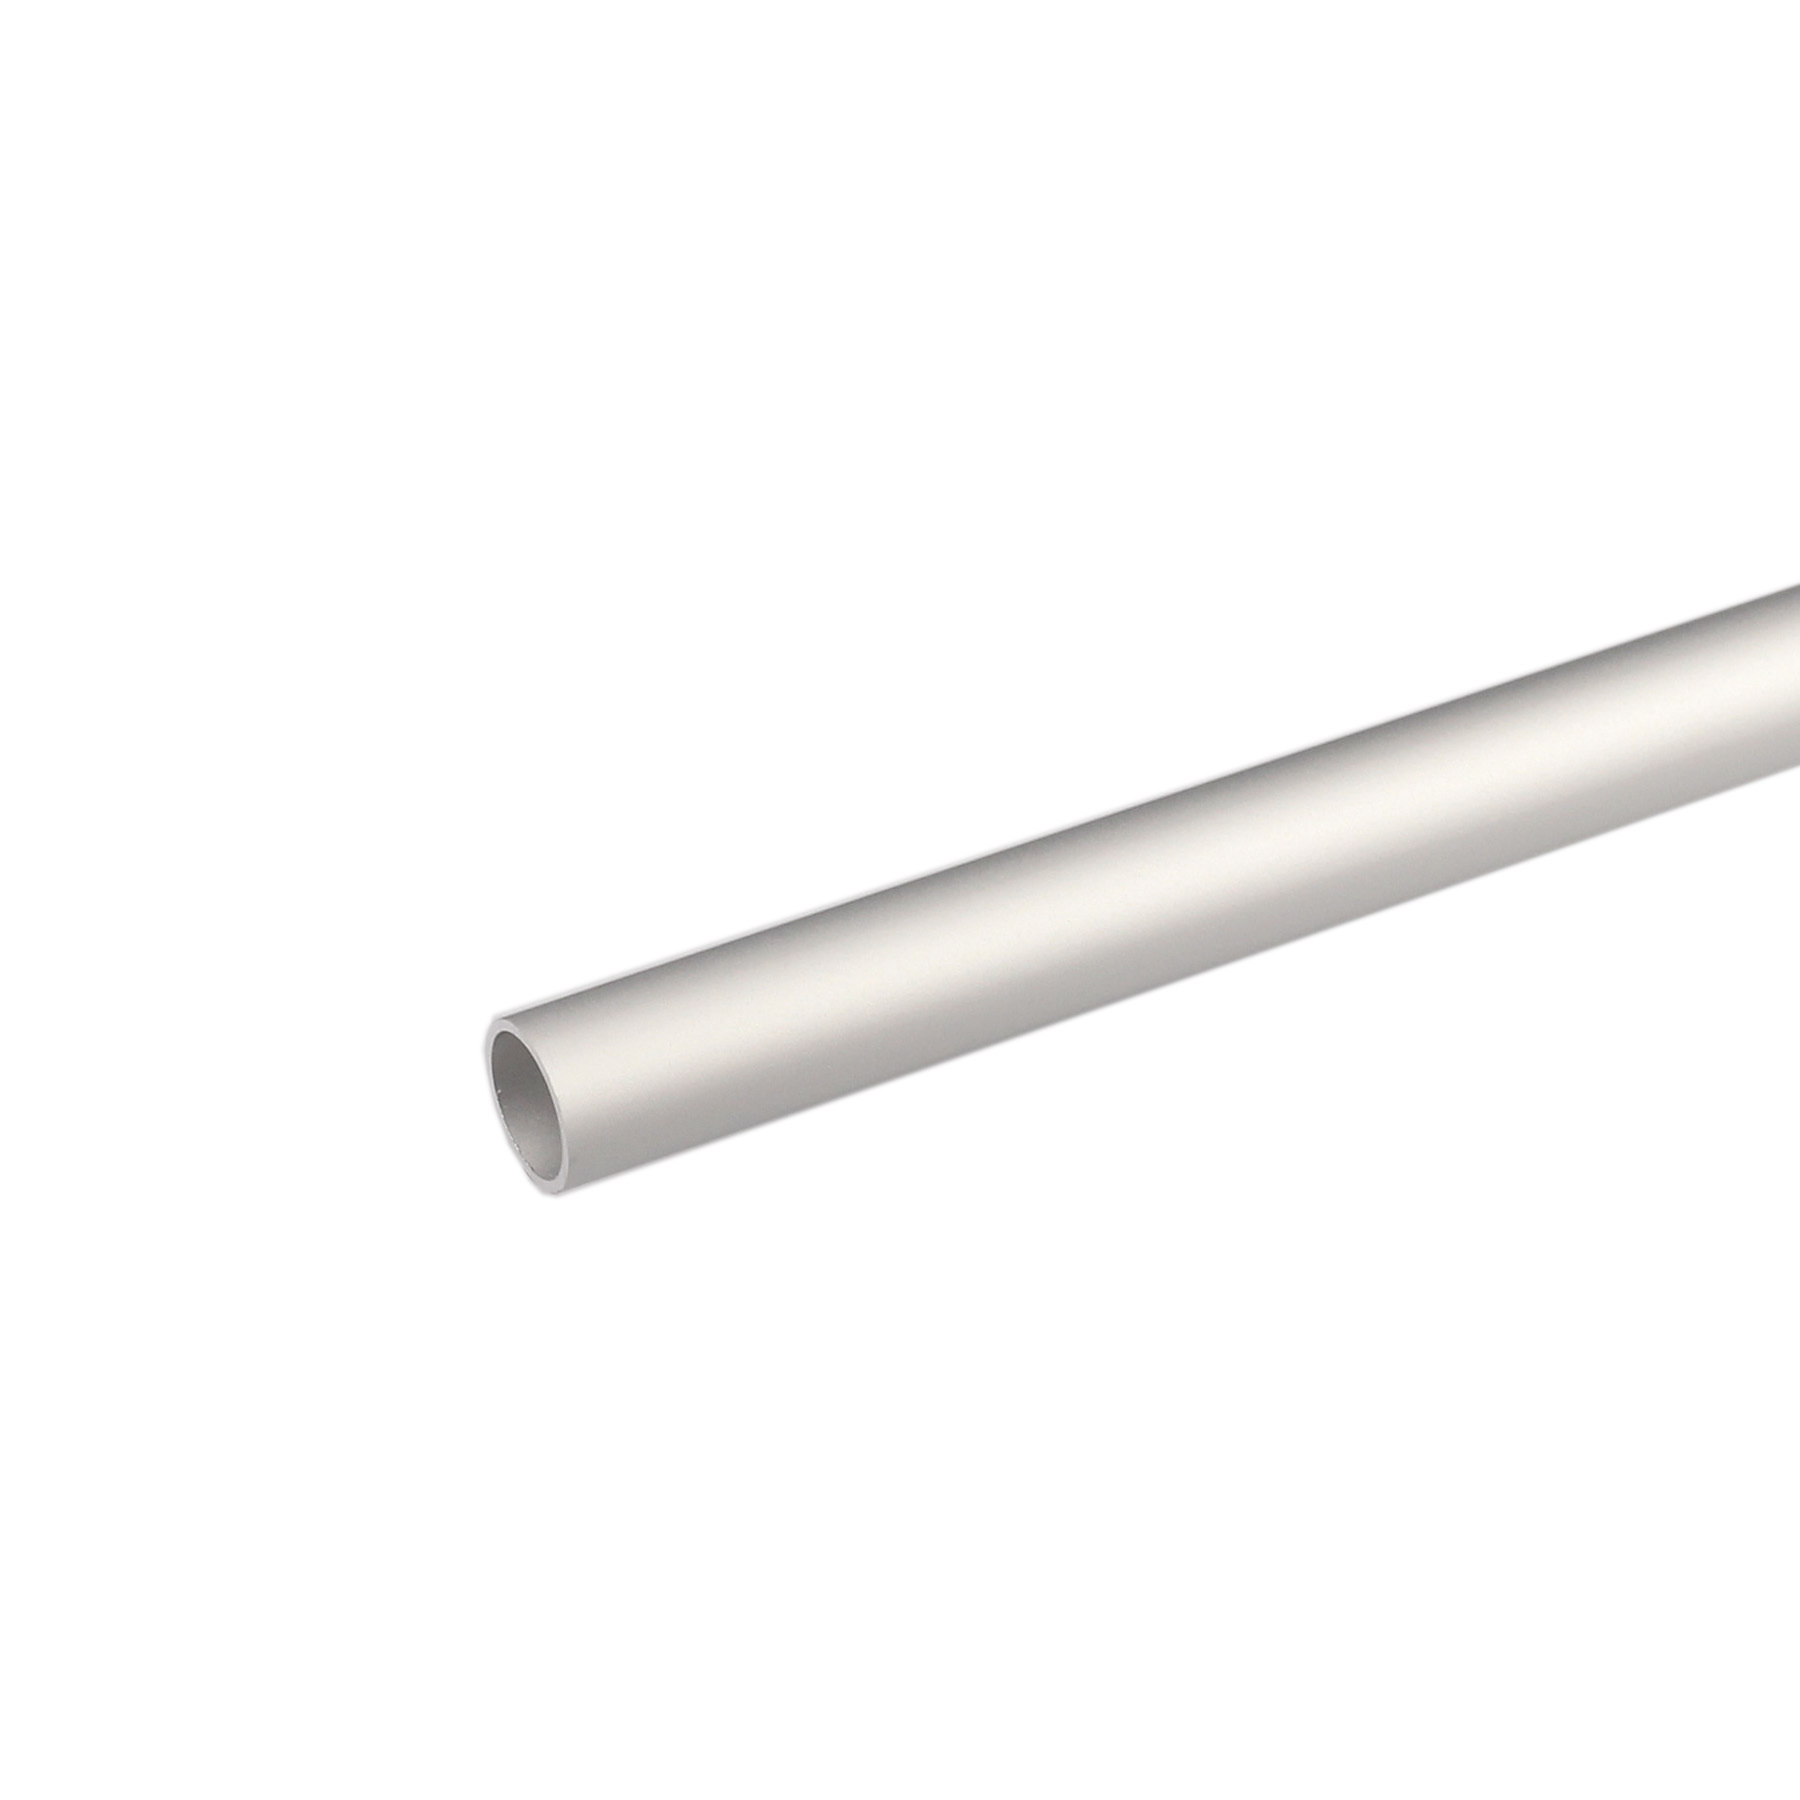 perfil alum nio tubo redondo 1mx12x1mm anodizado leroy